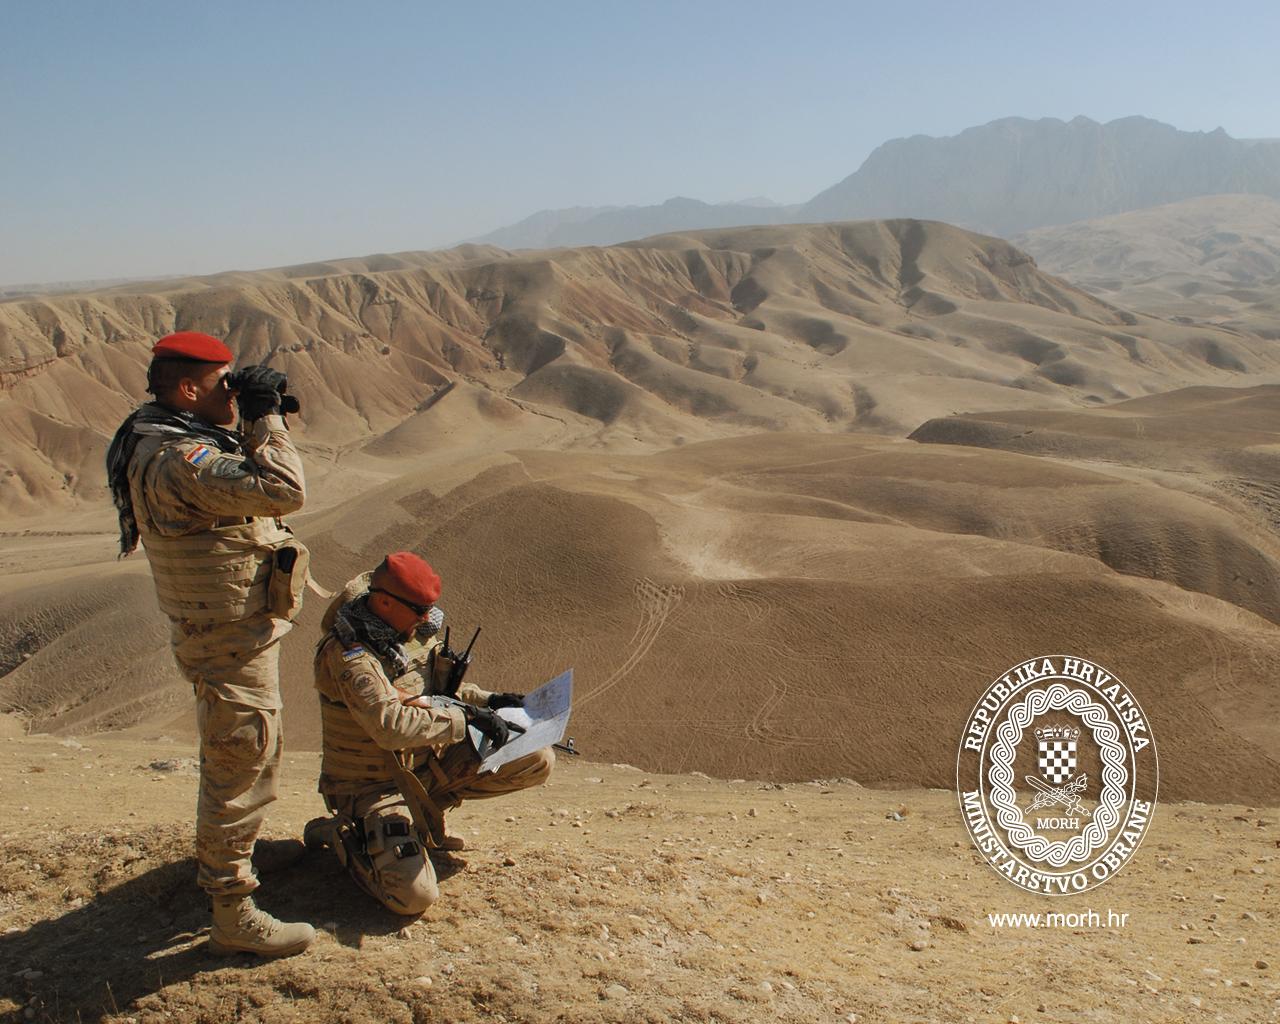 MORH Afganistan 1280 x 1050